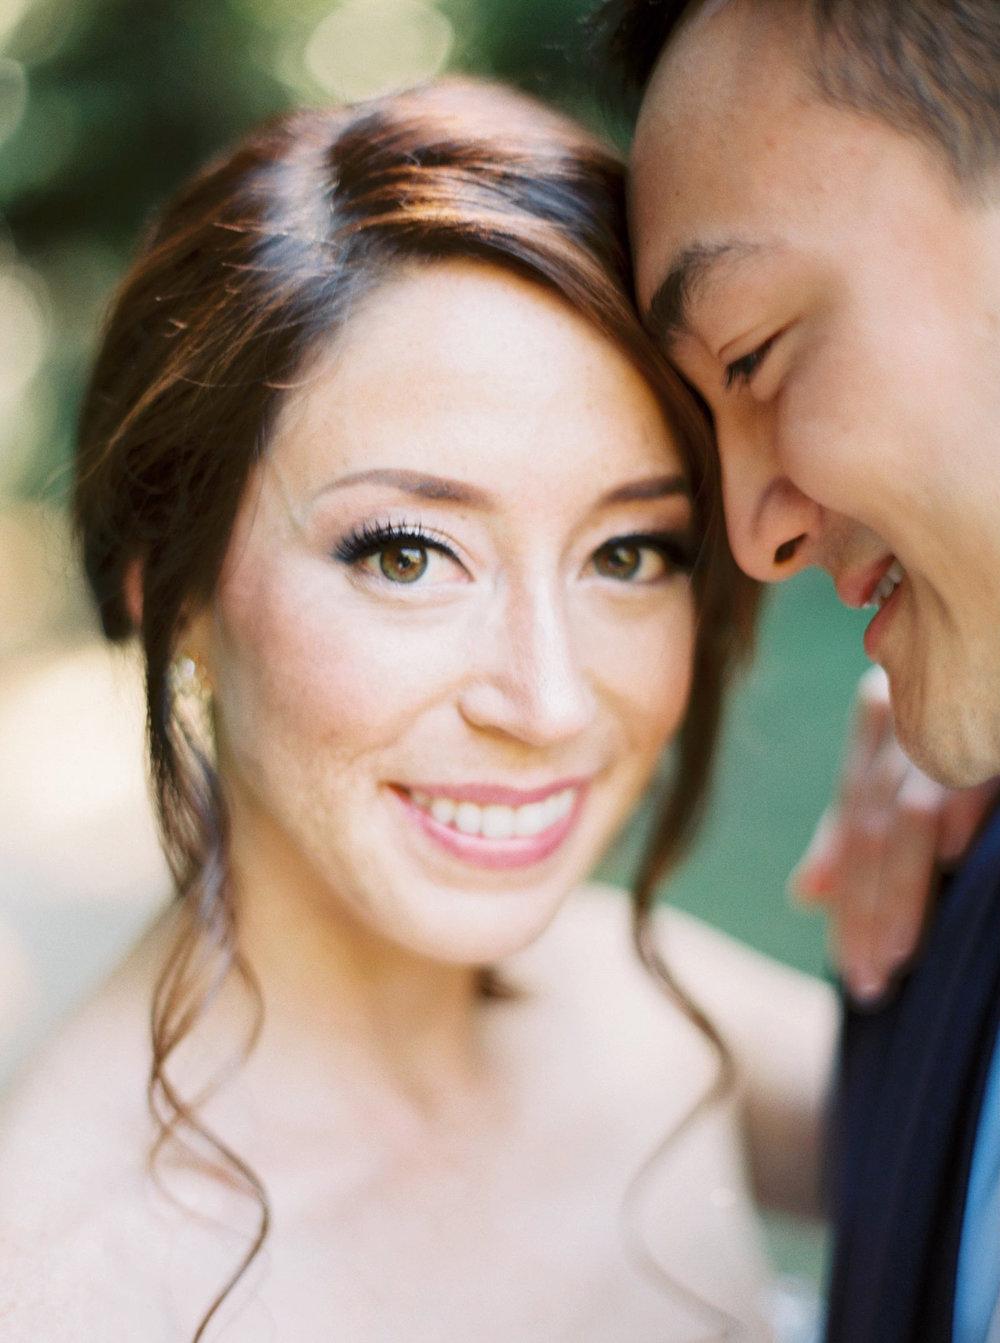 wedding ceremony Nestldown photos